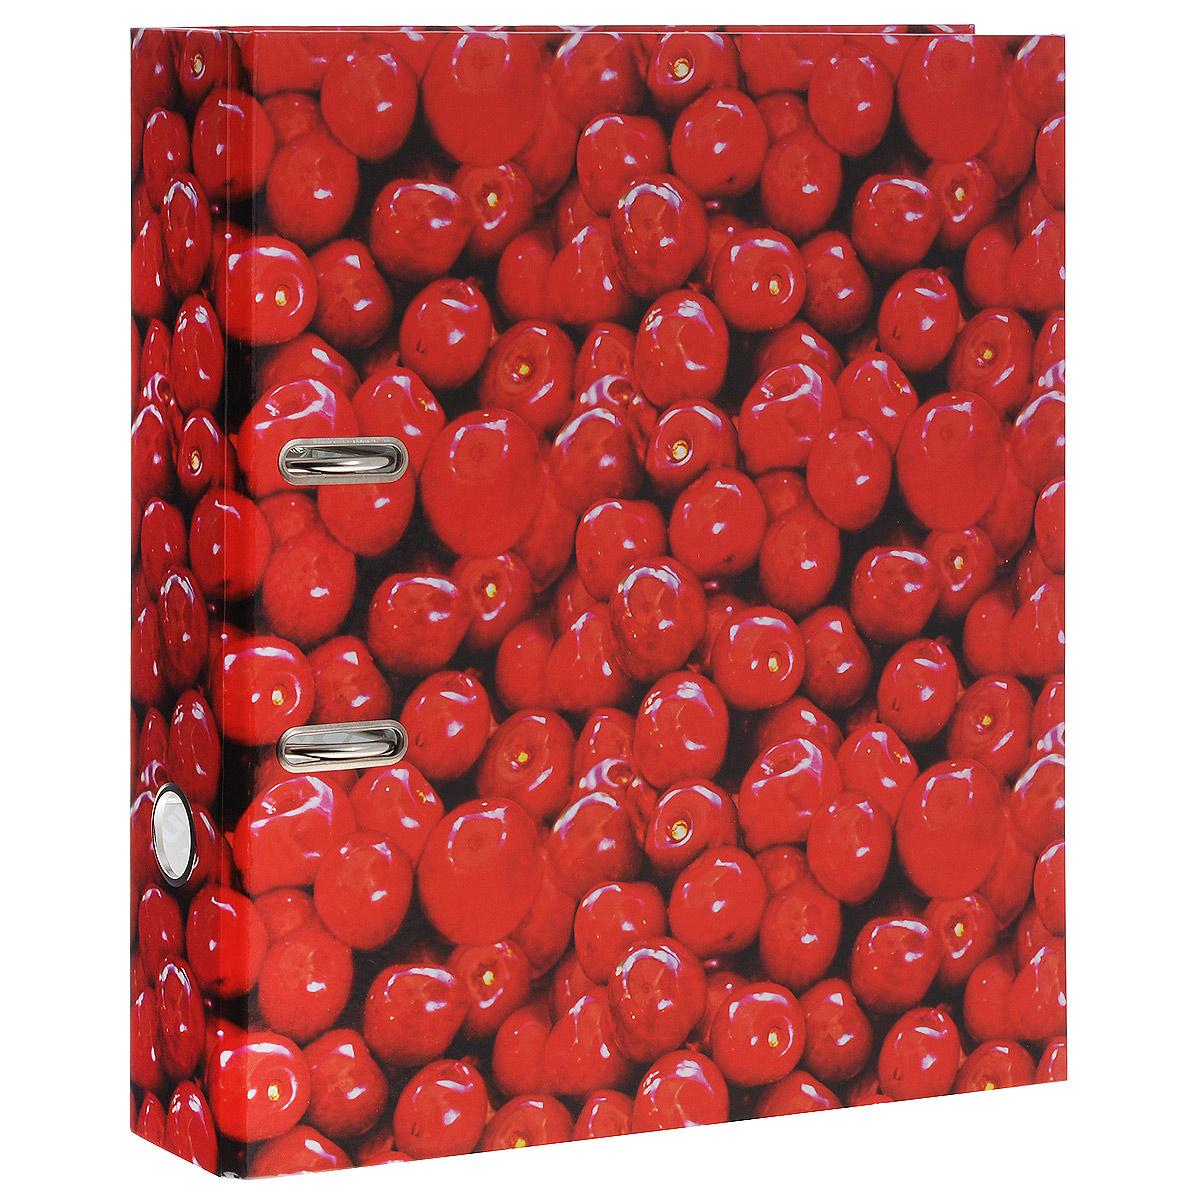 Папка-регистратор Вишня, ширина корешка 70 мм, цвет: красный. IN111103 папка регистратор hatber red on black ширина корешка 70 мм цвет черный красный